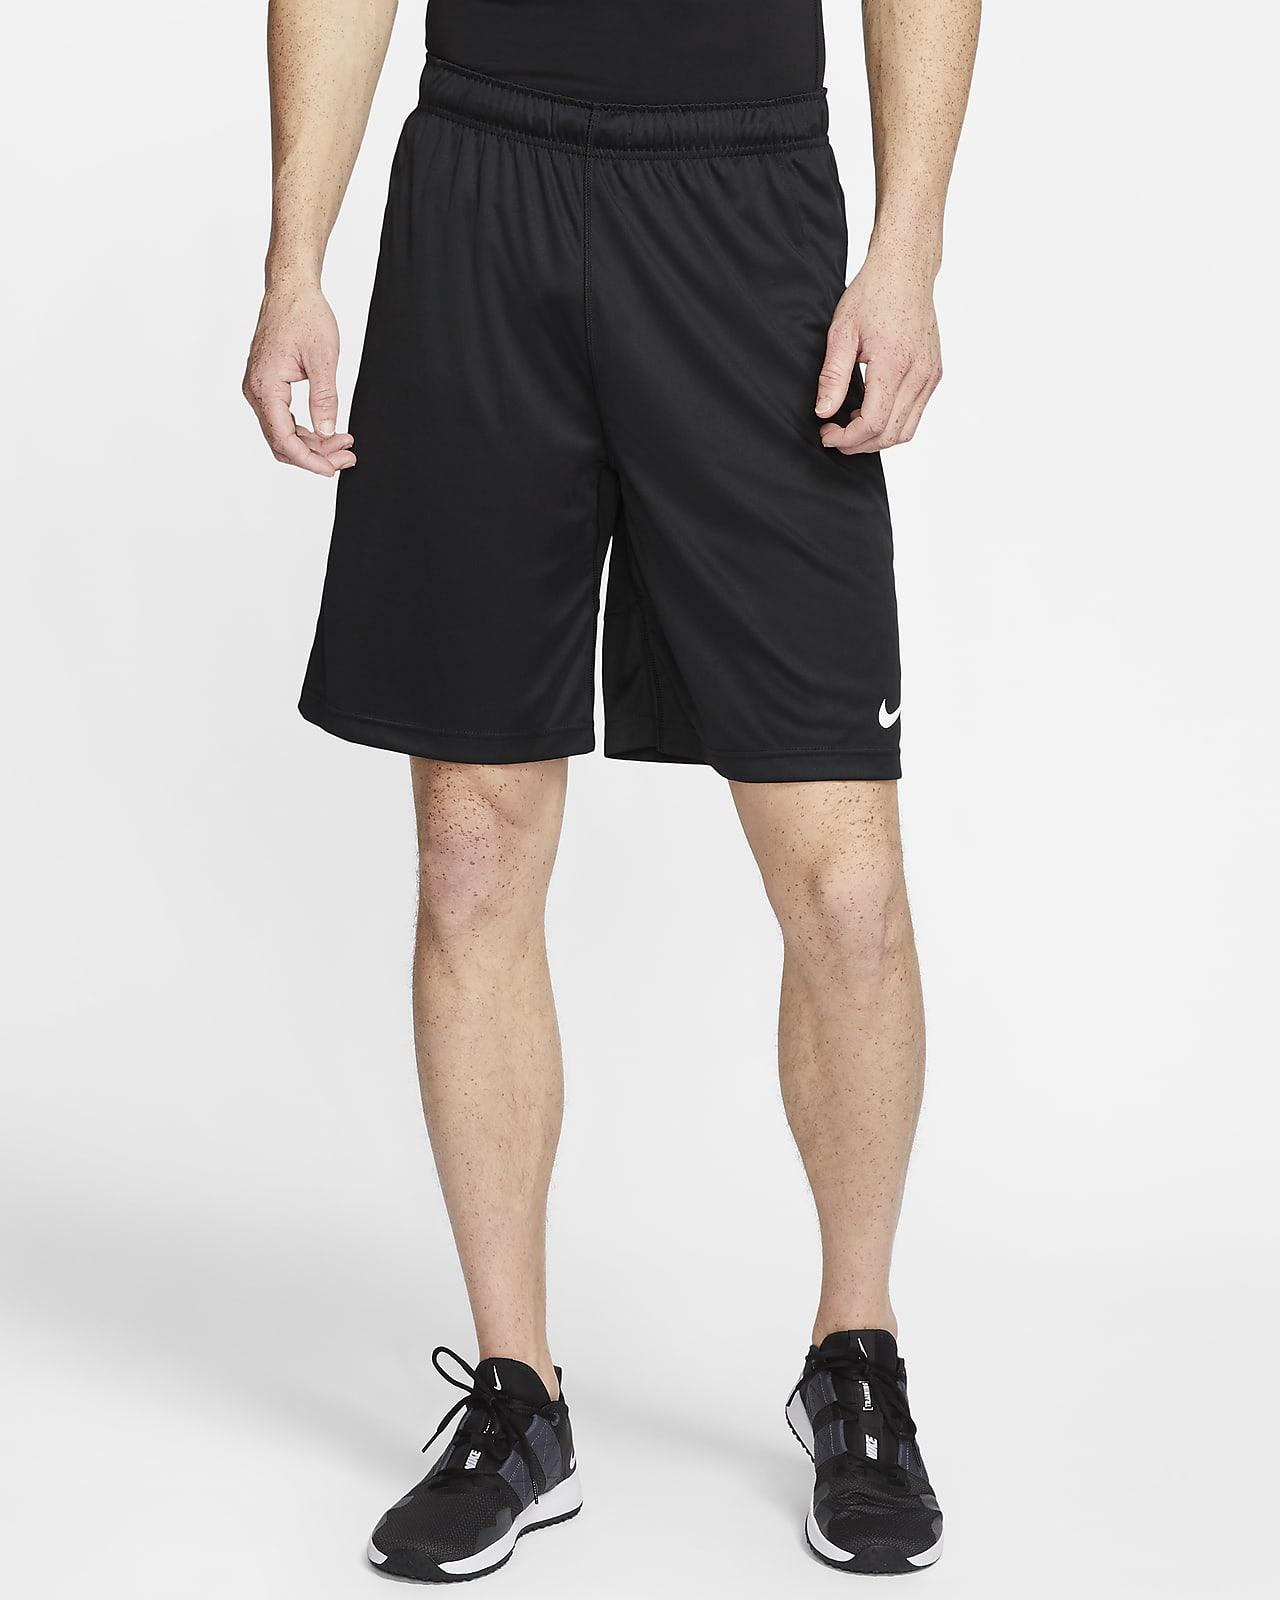 Nike Dri-FIT Men's Football Shorts